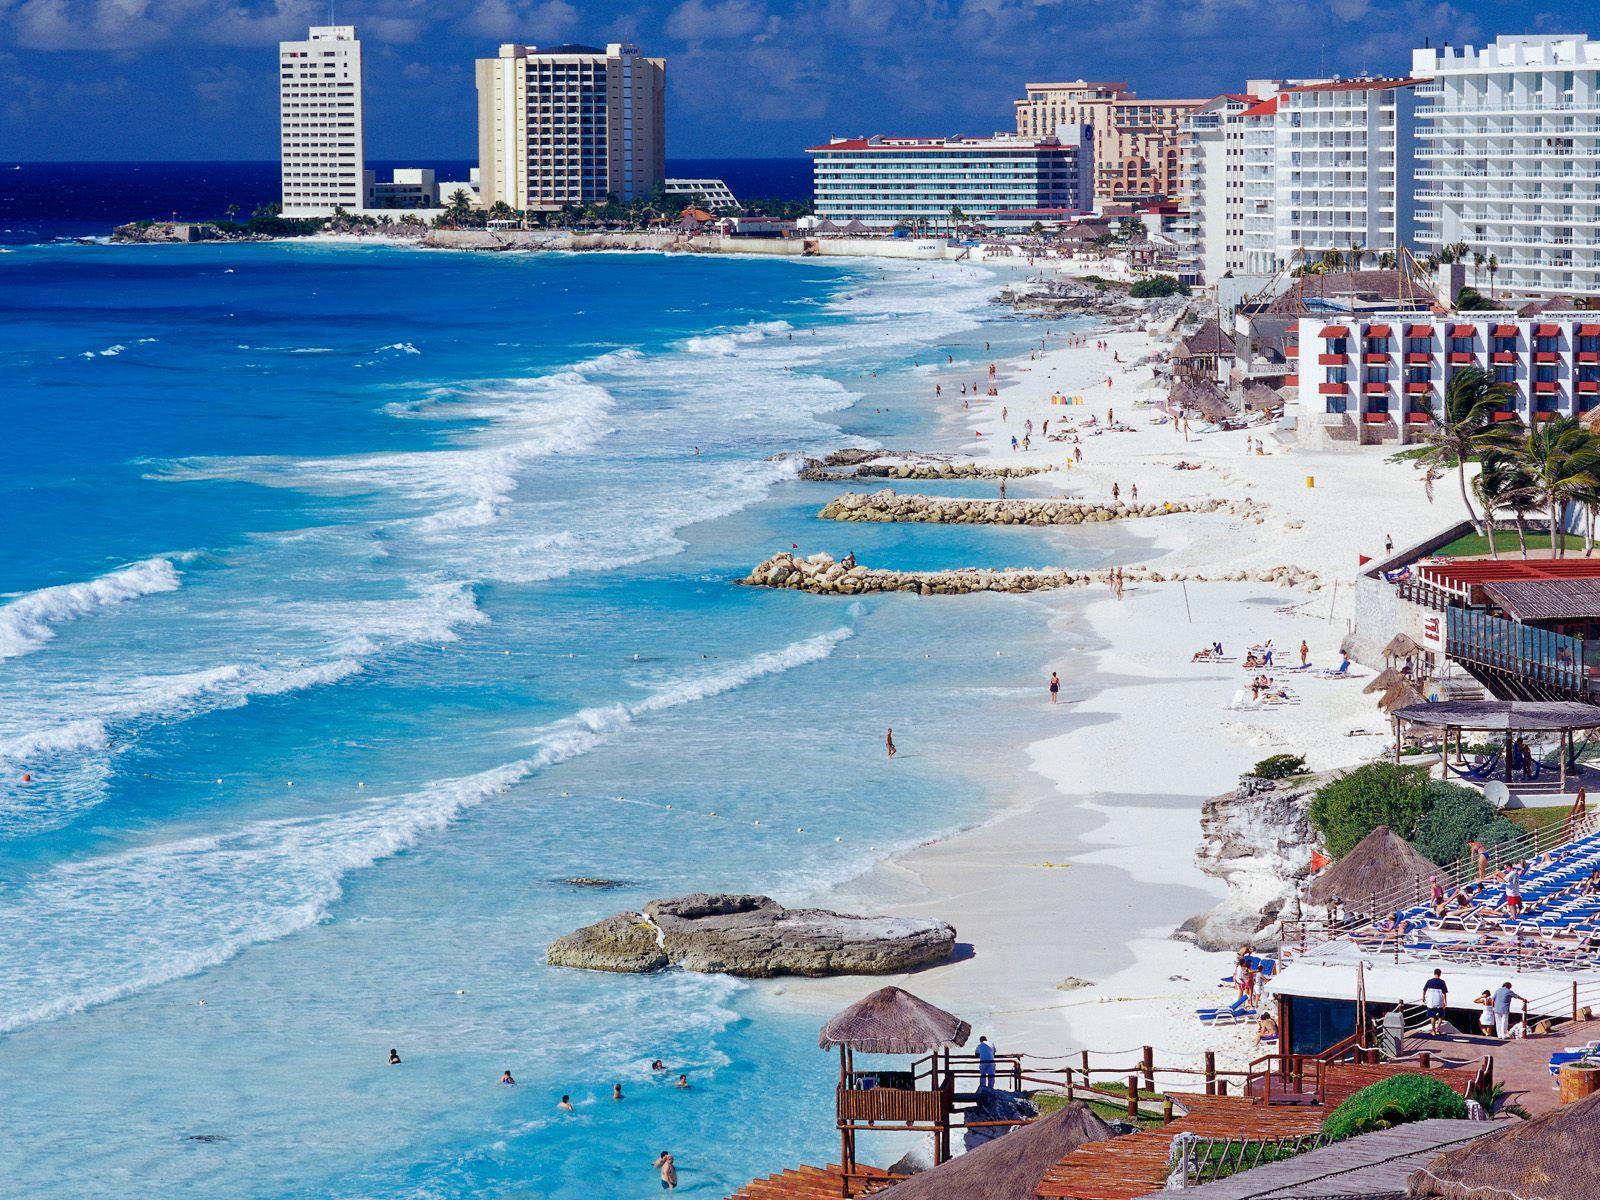 dovolená v mexiku 2016, Cancun